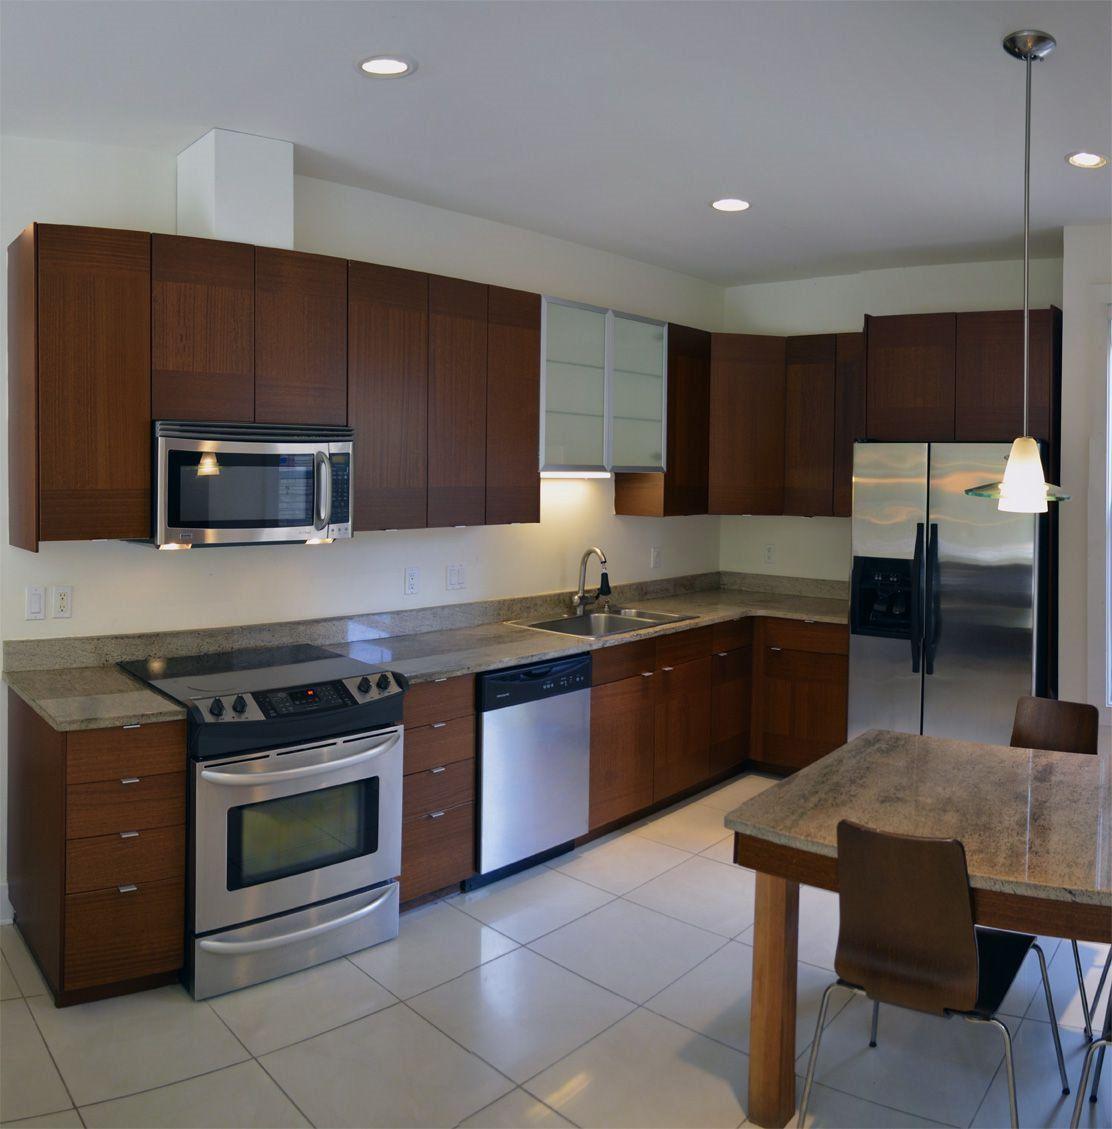 Rent Com: Tallahassee Student Housing